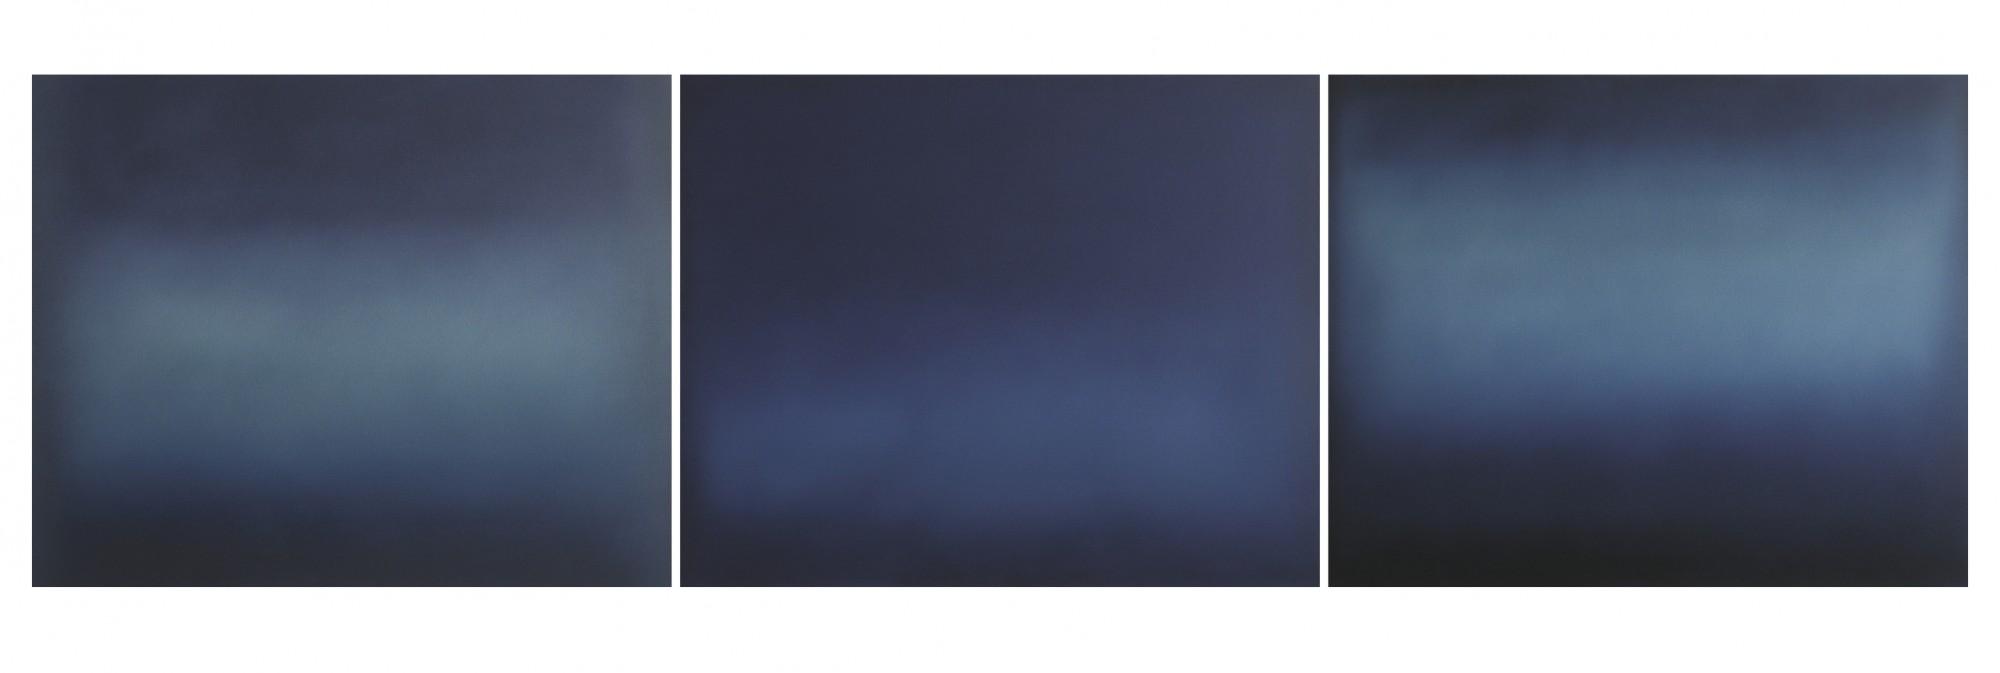 Adelheid Rumetshofer / cropped-Triptychon